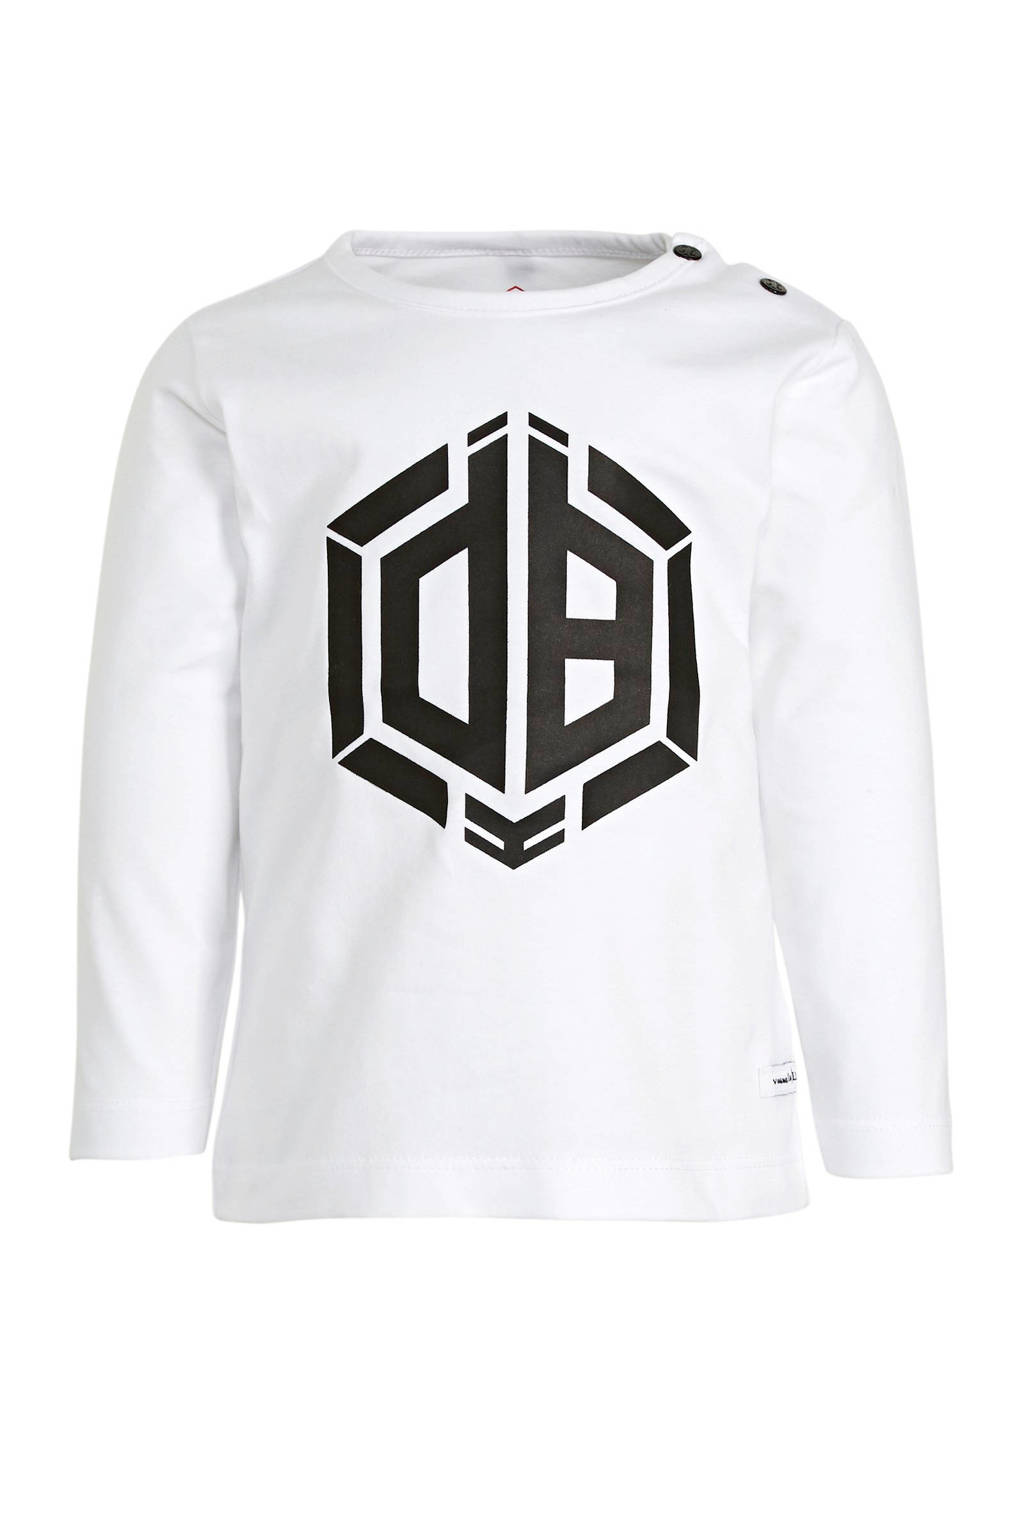 Vingino Daley Blind longsleeve Jaqua met logo wit/zwart, Wit/zwart